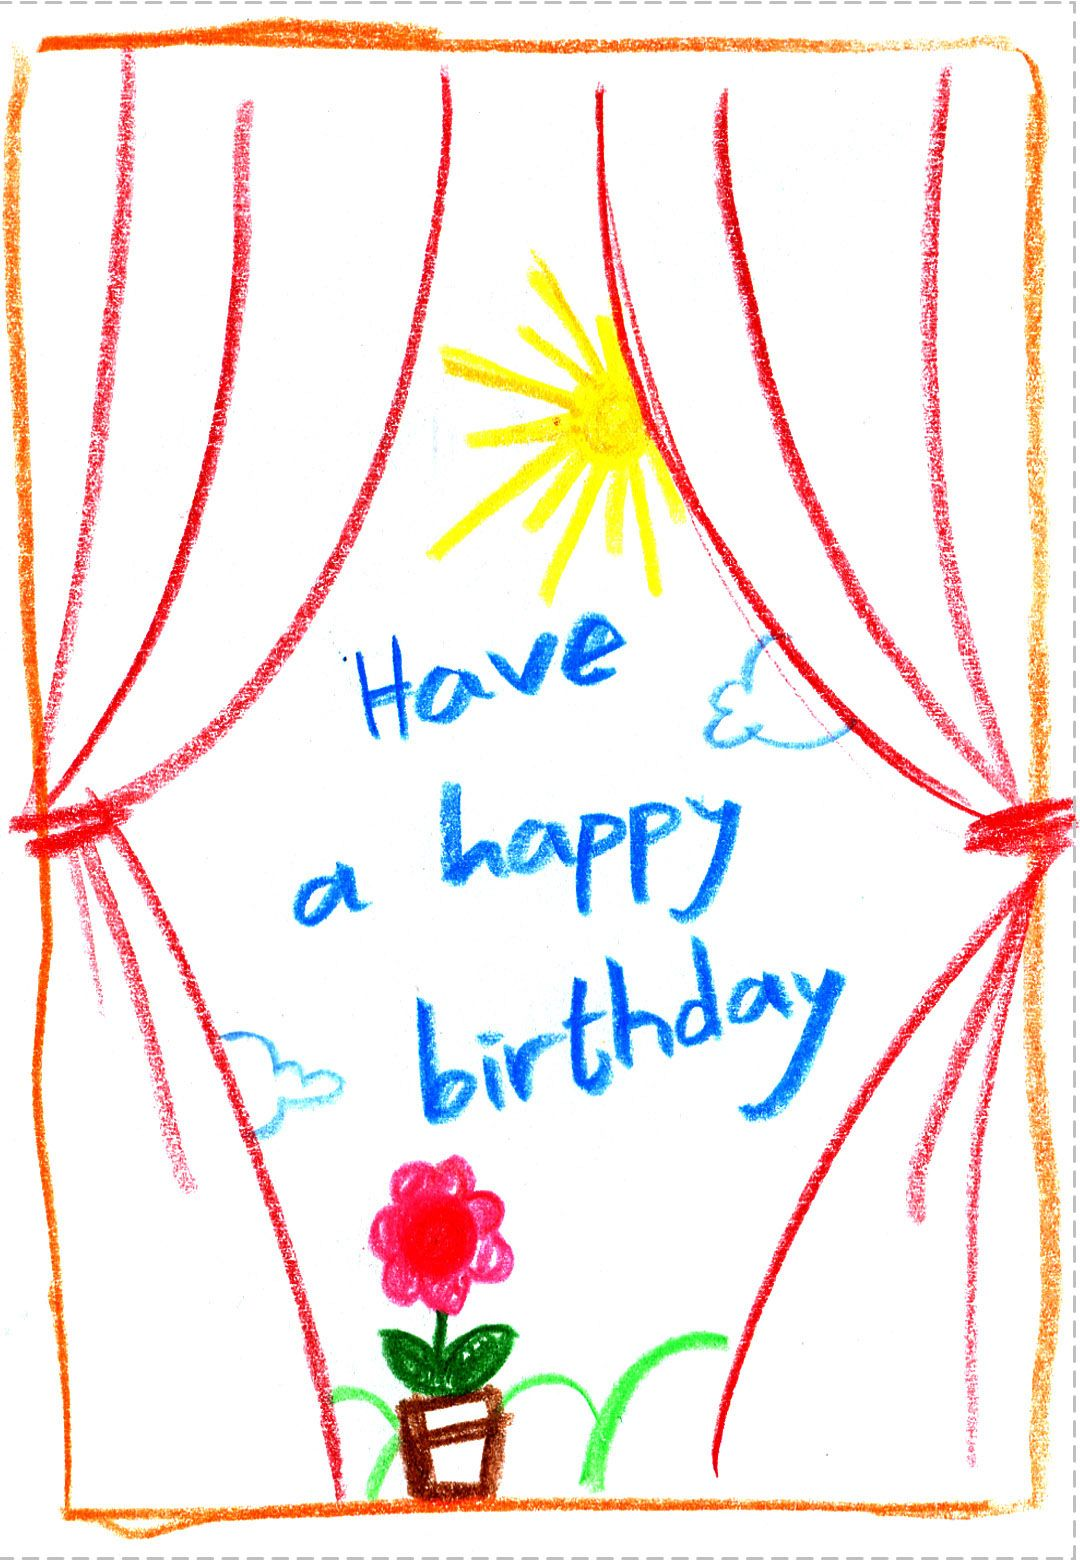 Iiiii happy birthday birthday collections pinterest happy birthday kristyandbryce Image collections